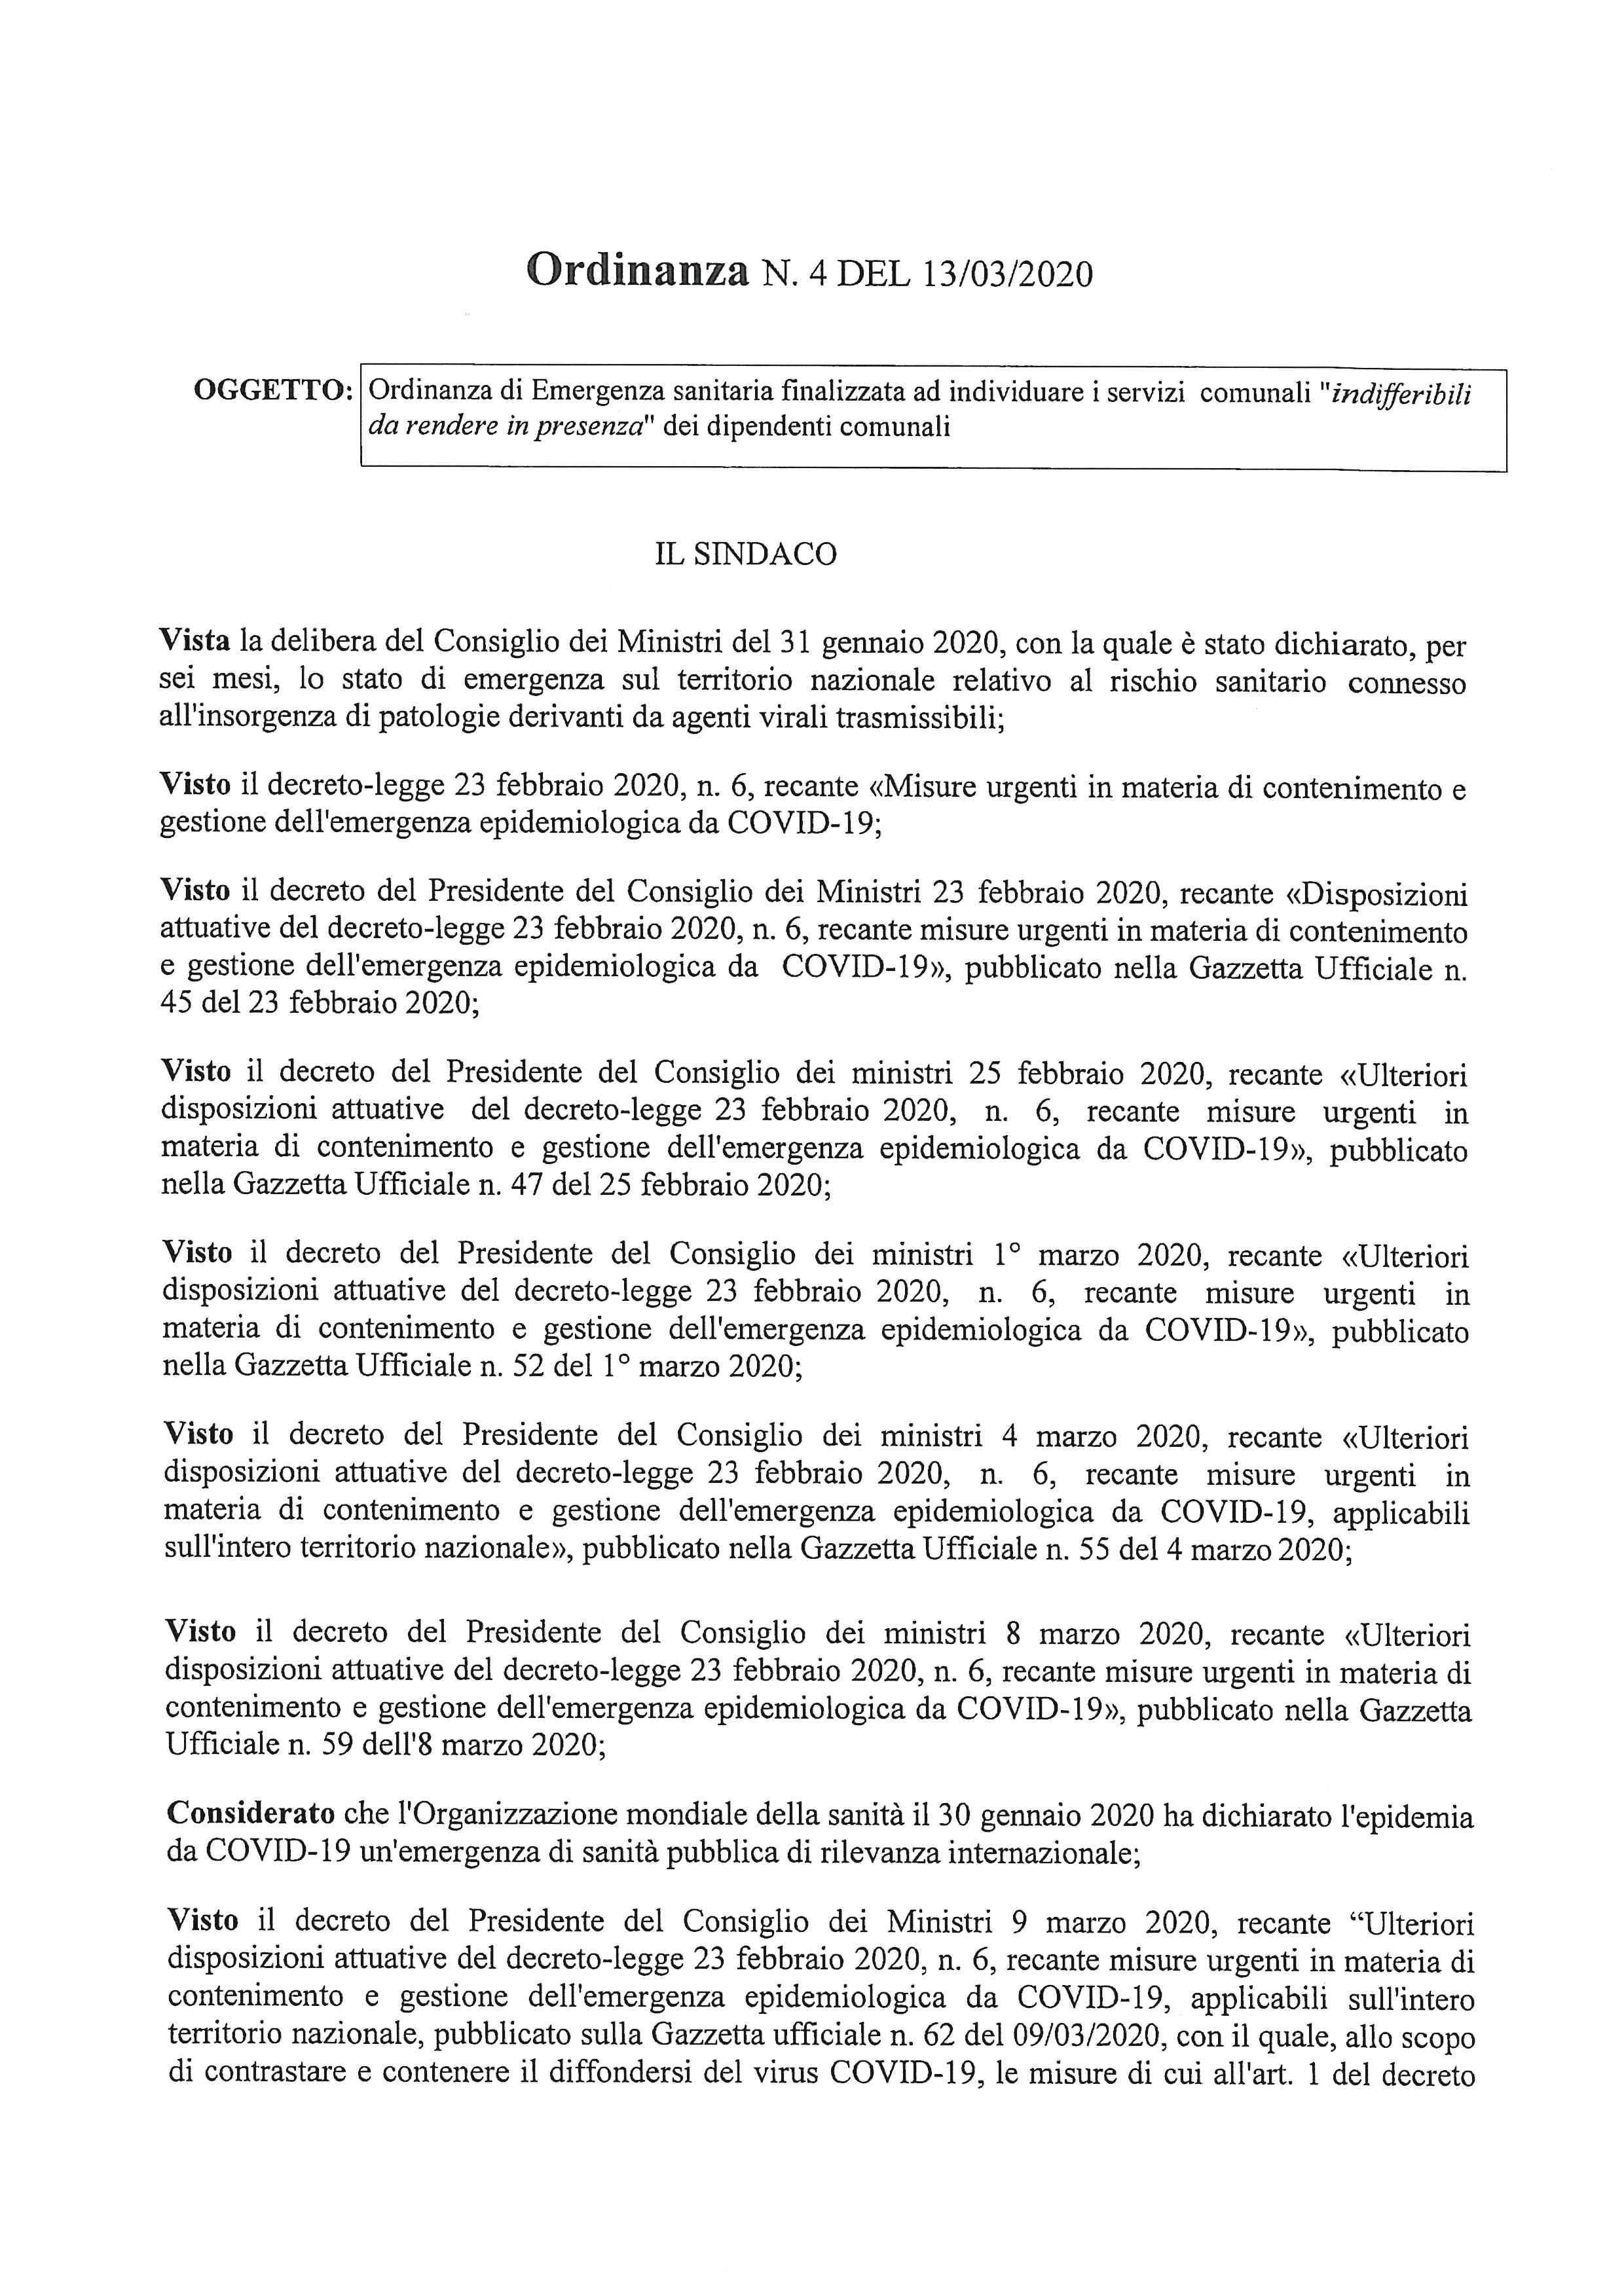 ORDINANZA SINDACALE N.4/2020